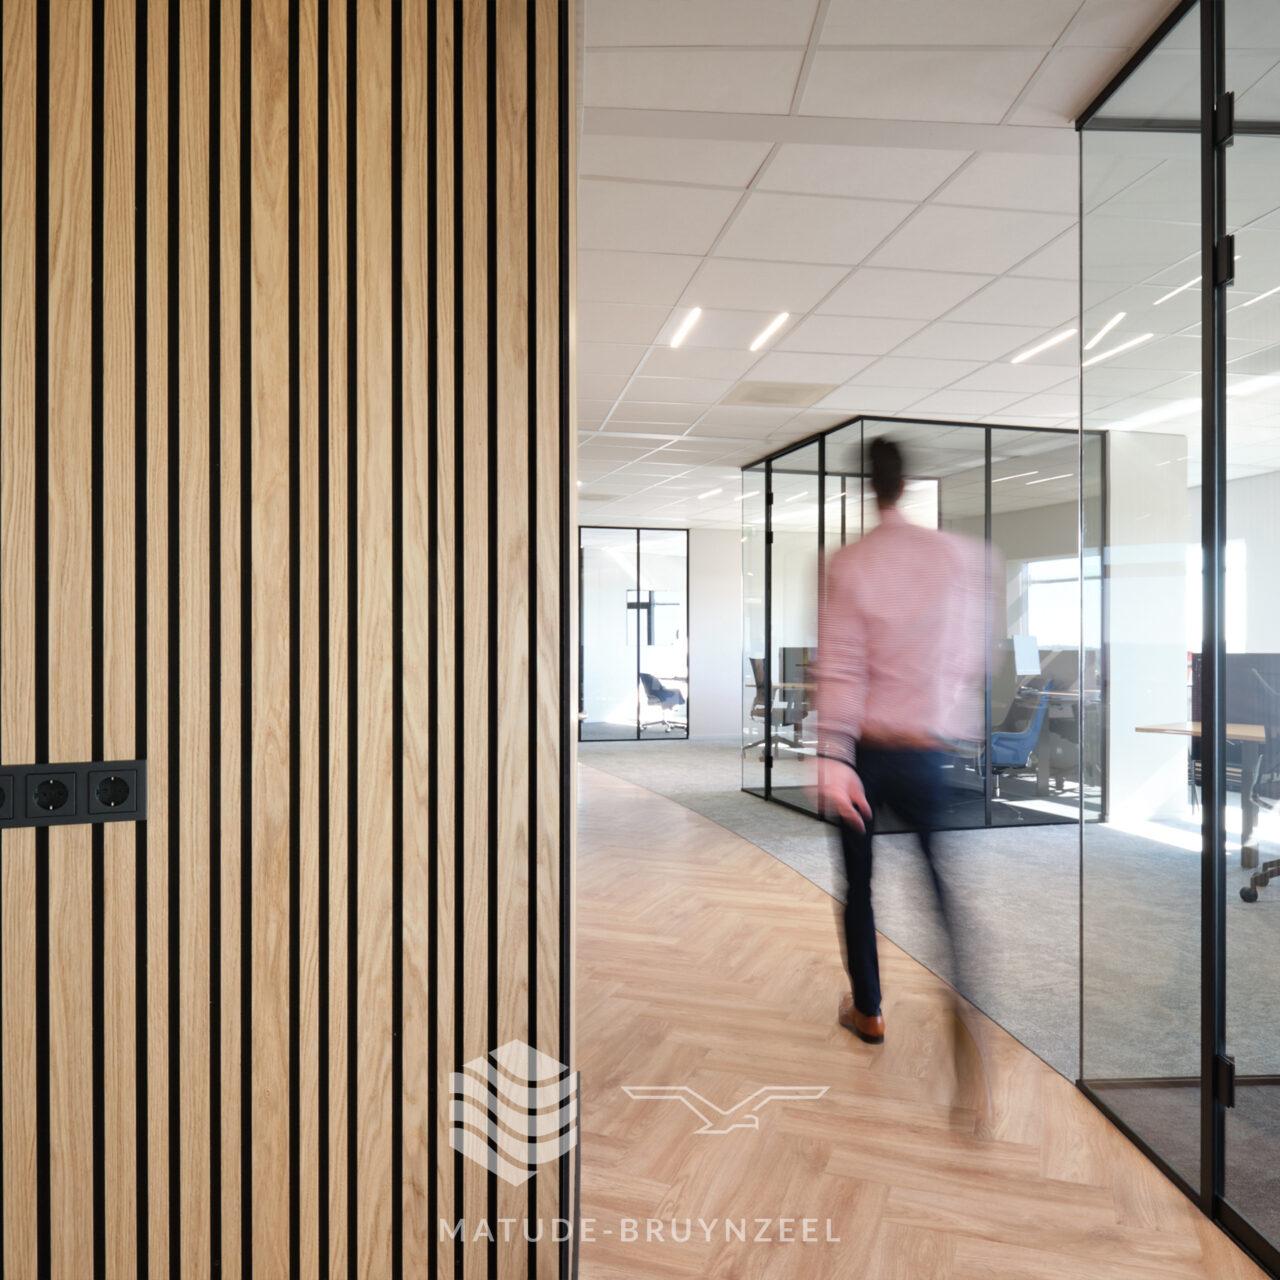 https://www.matude.nl/wp-content/uploads/2021/07/Matude_Bruynzeel_Woodline_Sofa_Company_05-1280x1280.jpg